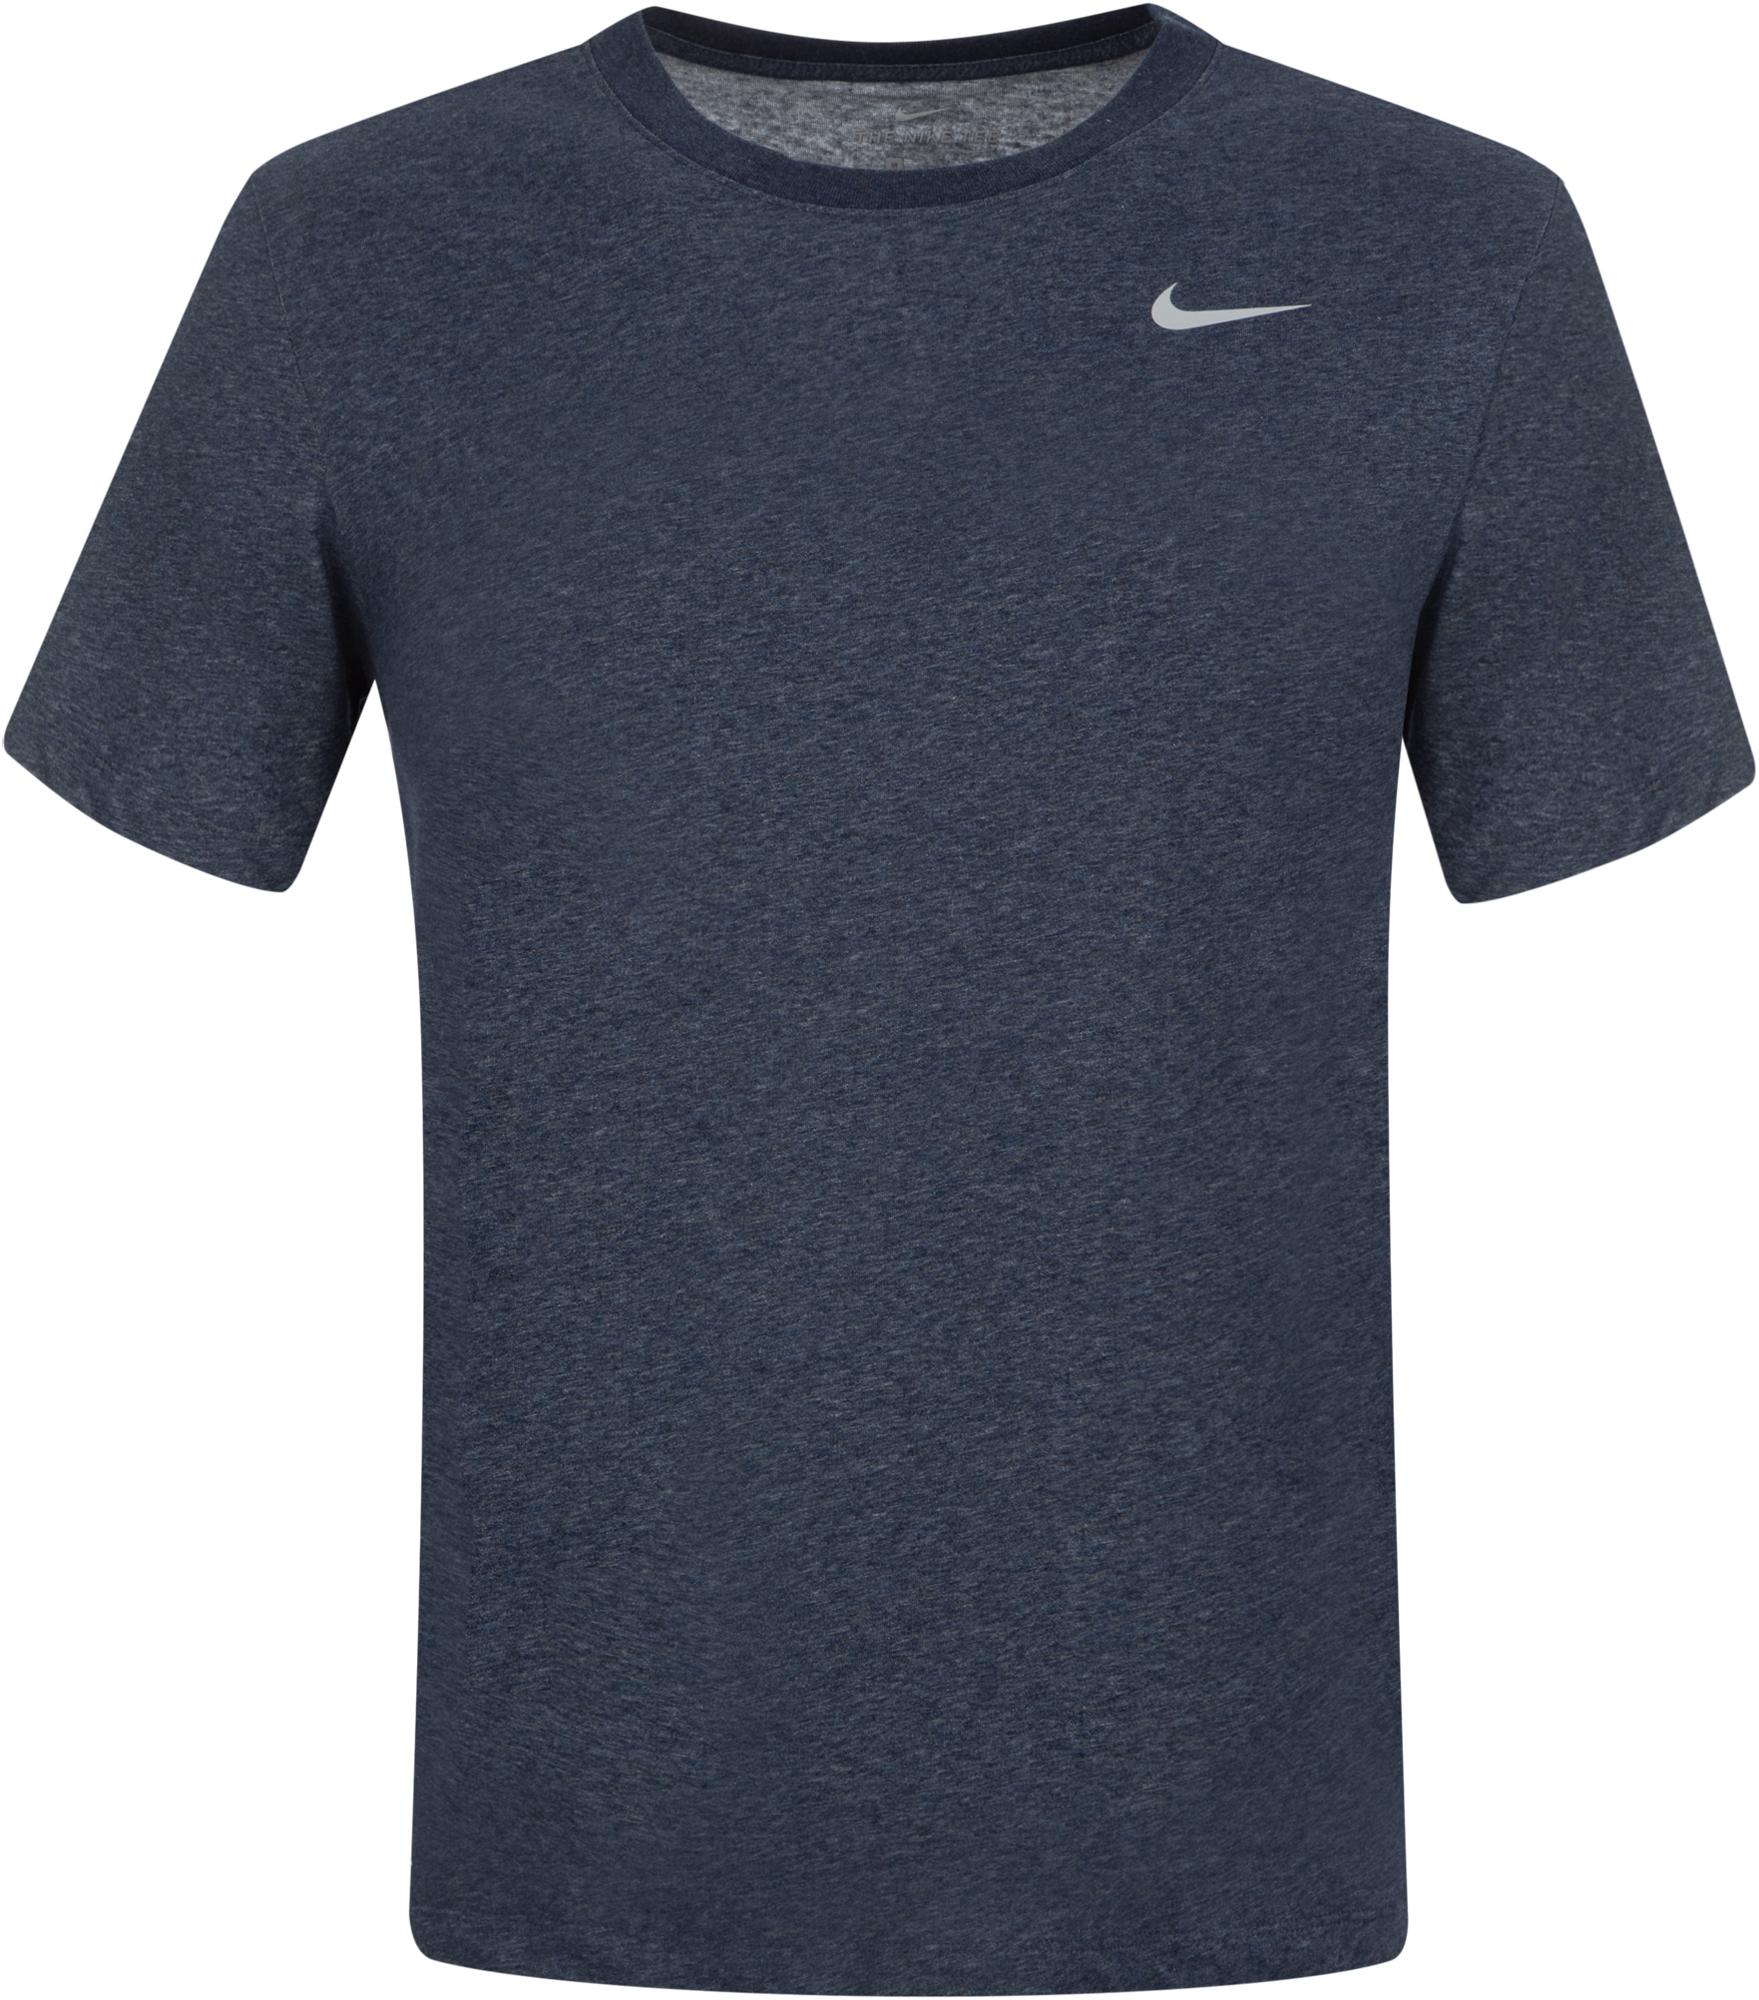 Nike Футболка для тренинга мужская Nike, размер 54-56